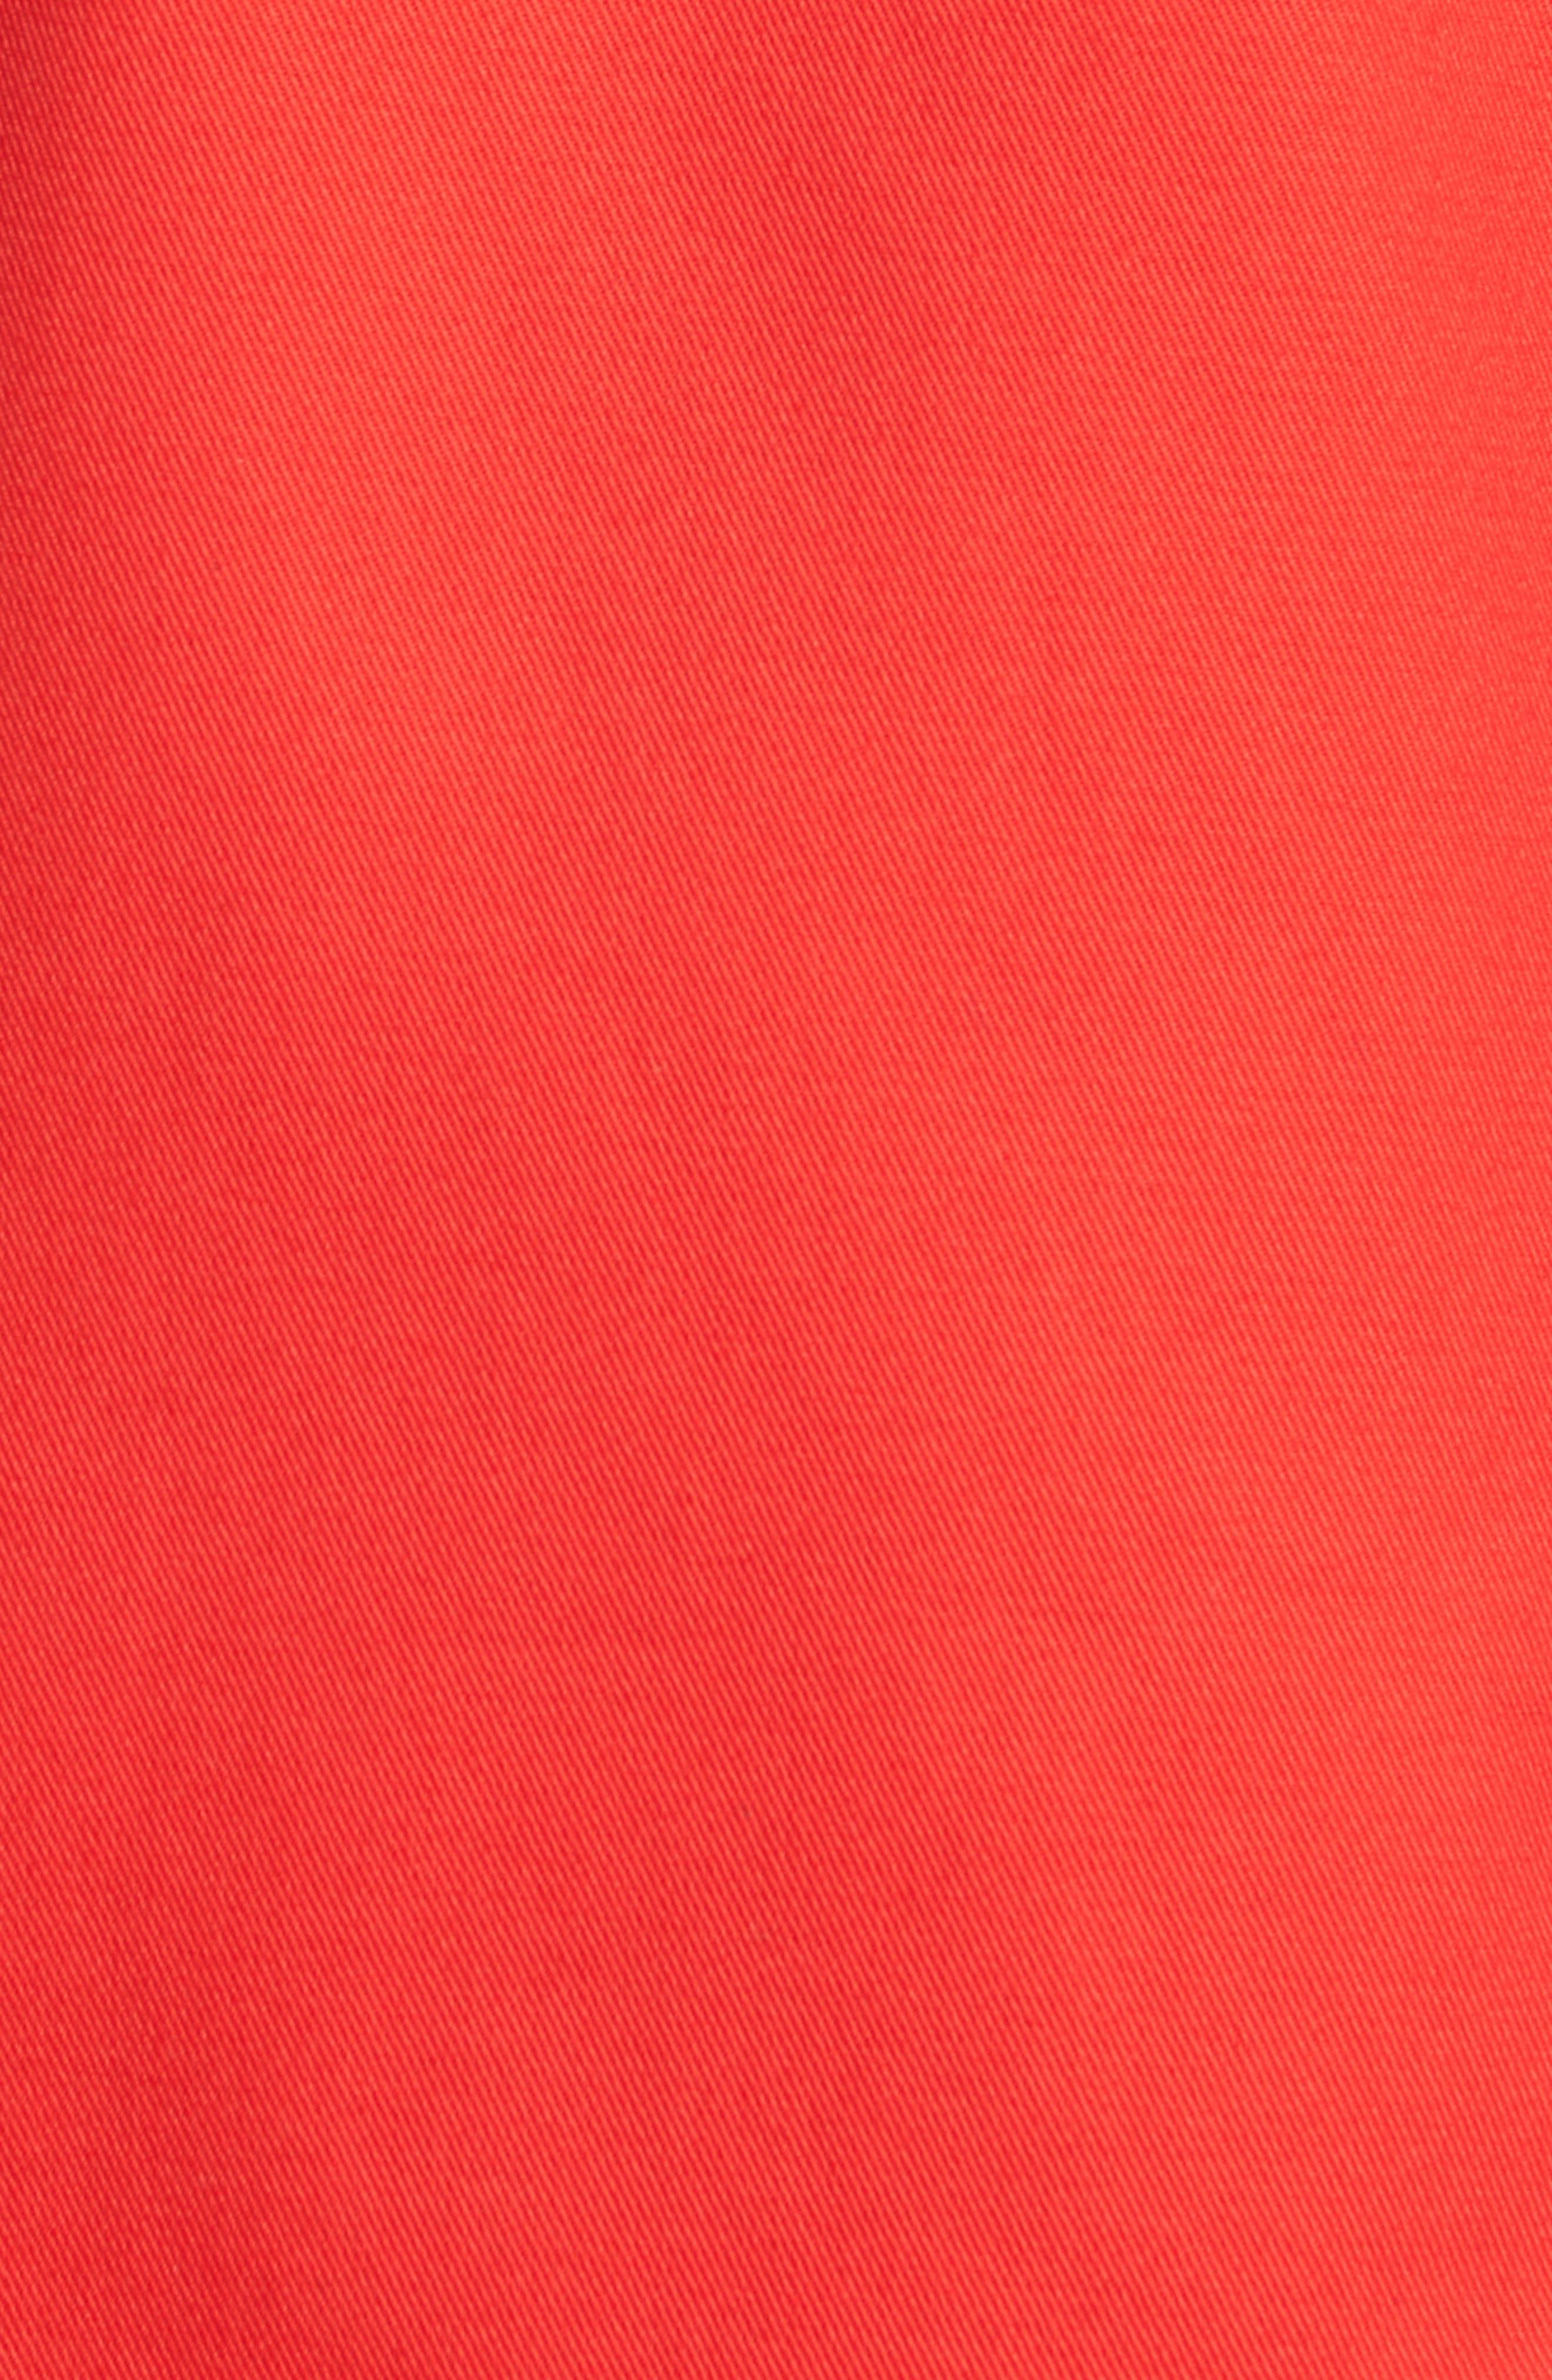 & Bros. Crew Field Jacket,                             Alternate thumbnail 6, color,                             646